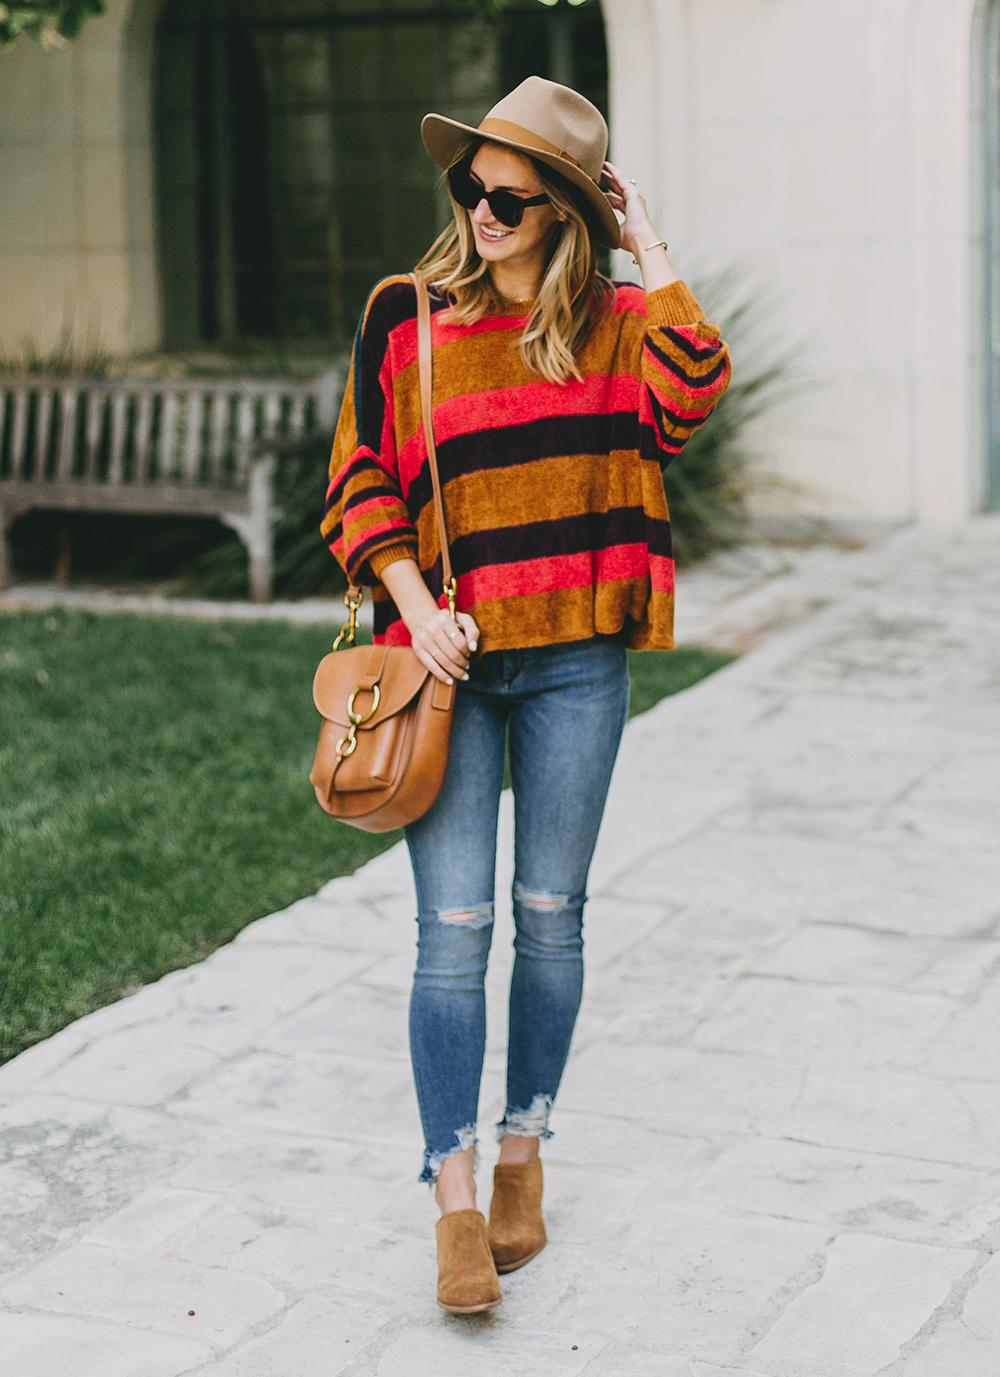 livvyland-blog-olivia-watson-austin-texas-fashion-blogger-free-people-oversize-striped-sweater-boho-chic-5